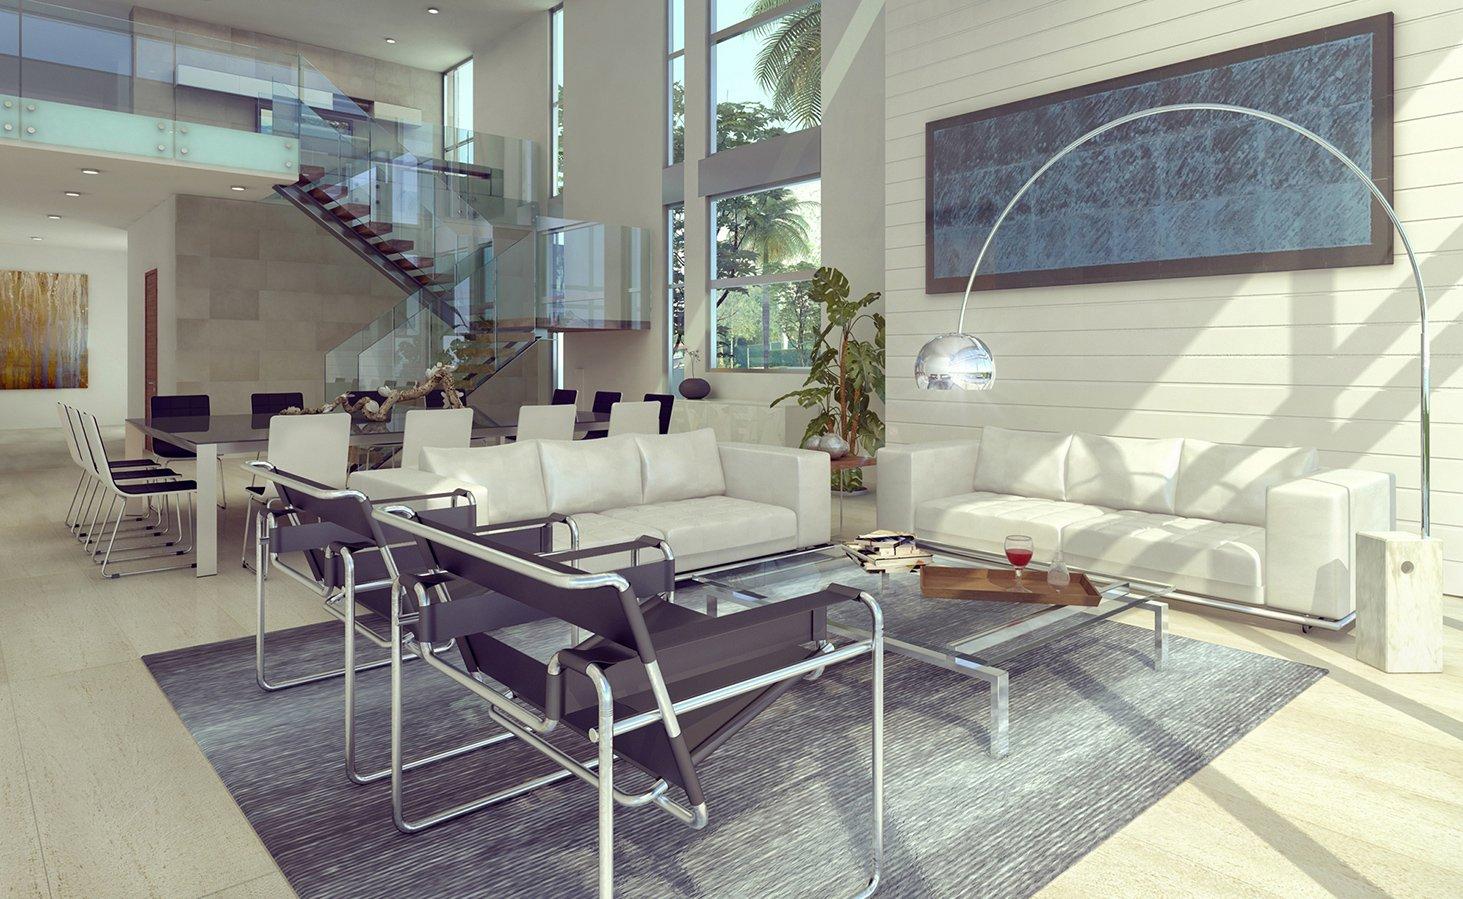 Interior Design living room view project in 77 Bal Harbuor, Florida